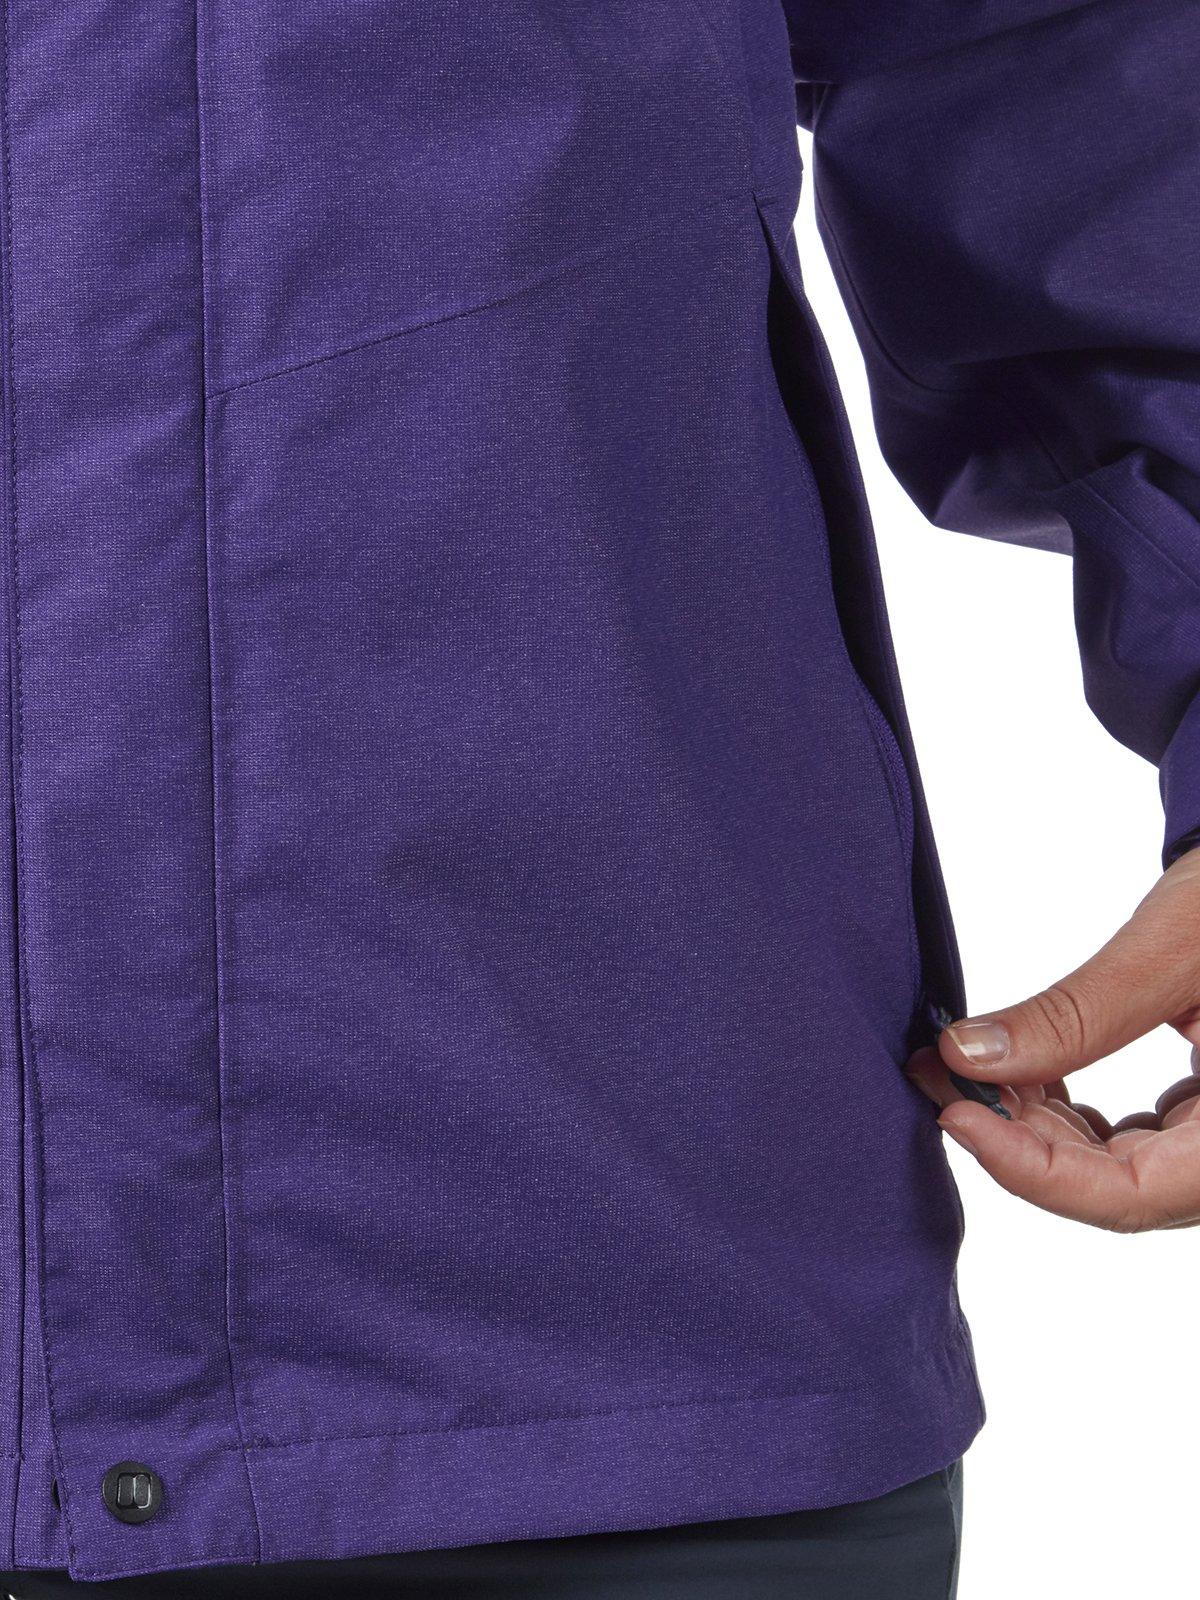 81zHaNRW4dL - Berghaus Women's Elara Waterproof Jacket